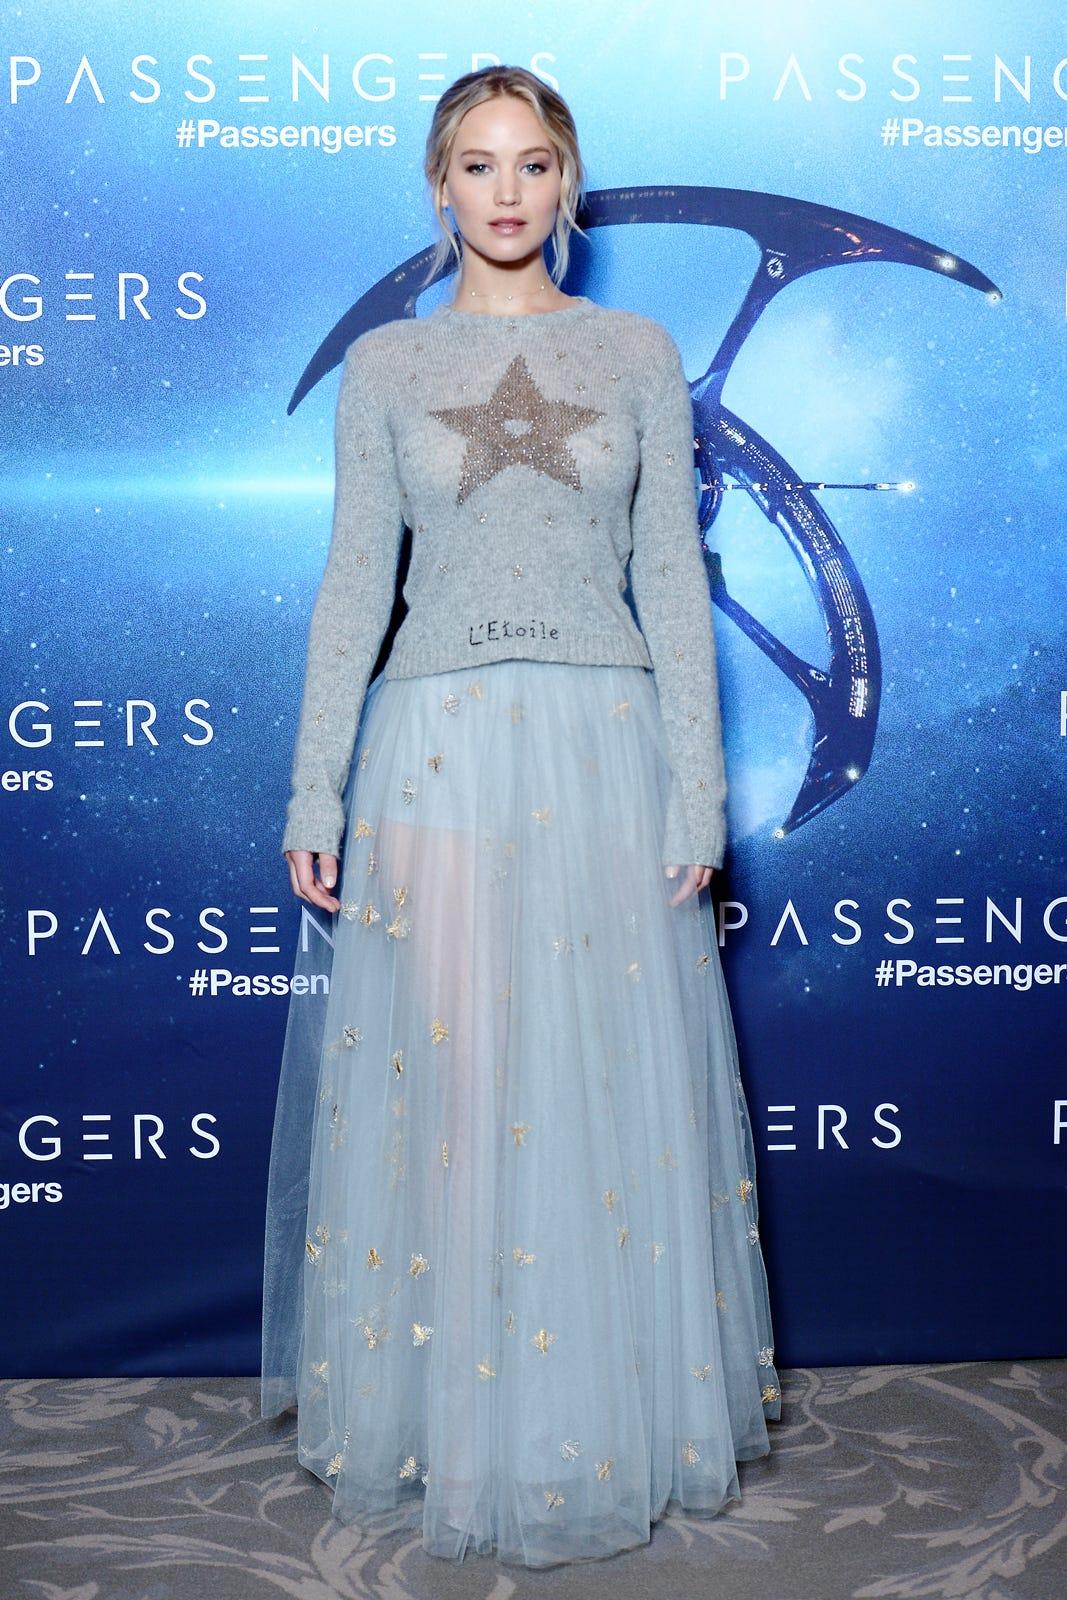 Resultado de imagem para jennifer lawrence dresses passenger premieres